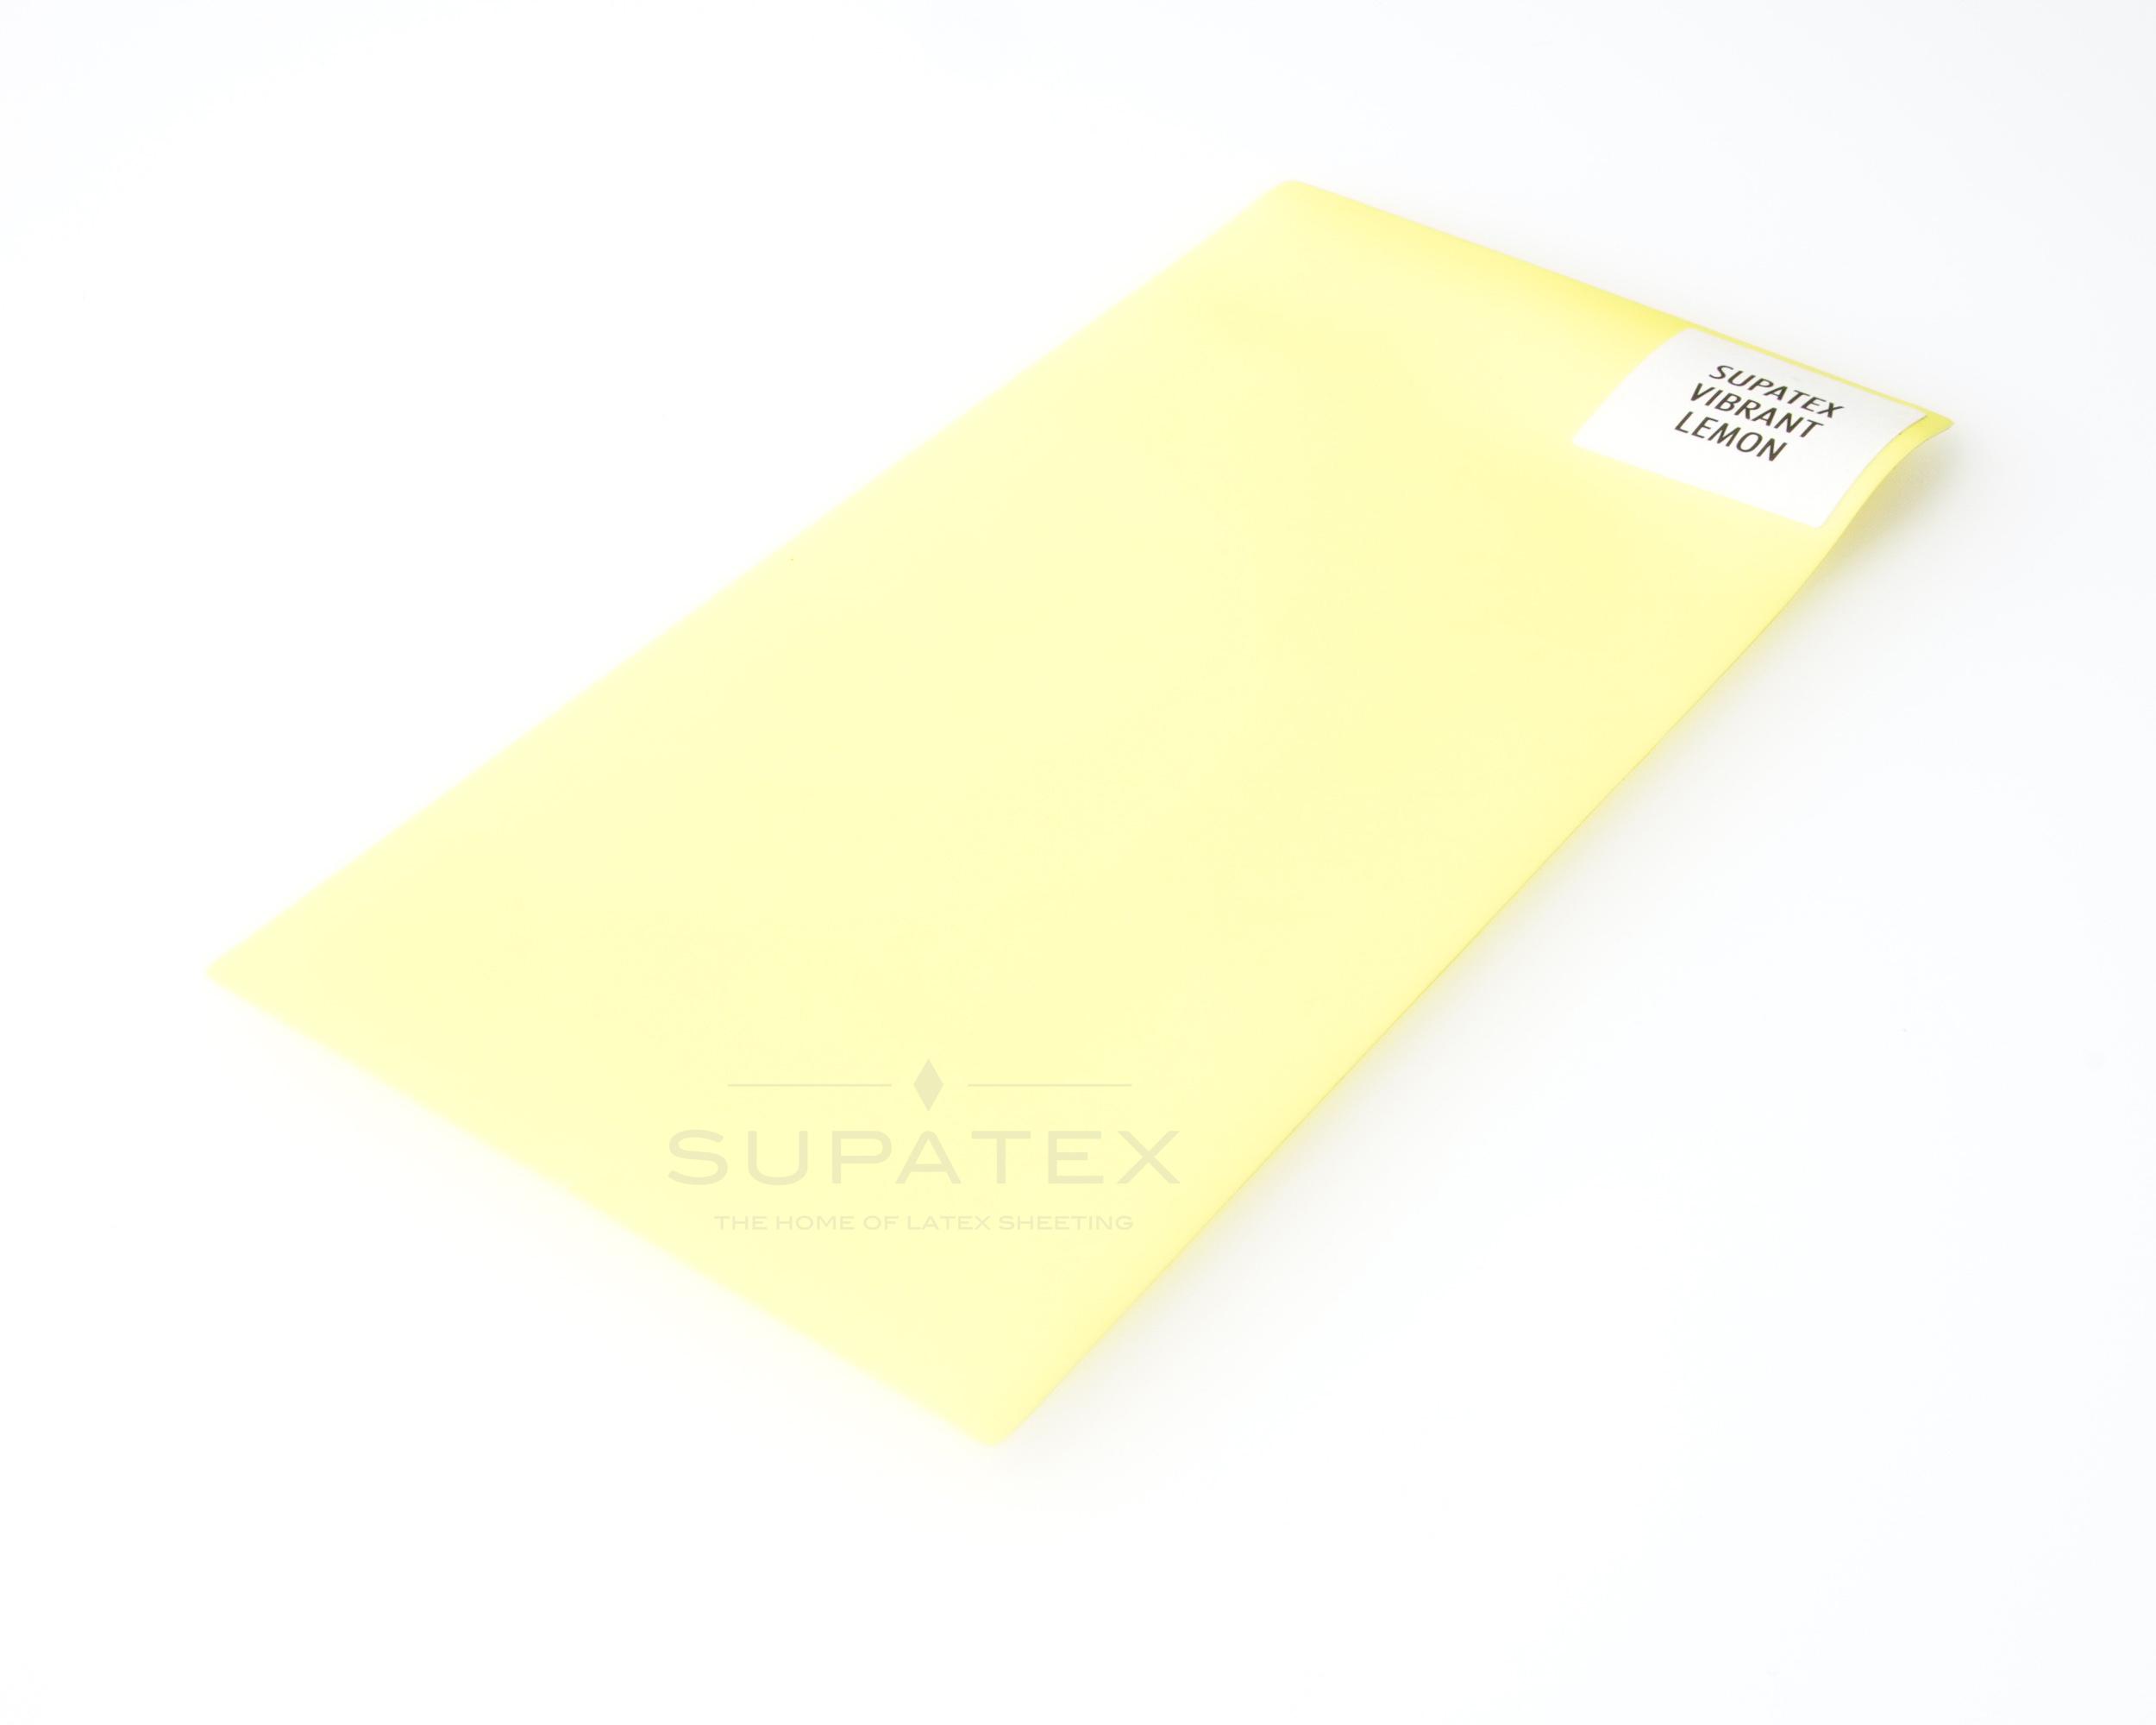 Supatex Vibrant Lemon Yellow 0.33 mm